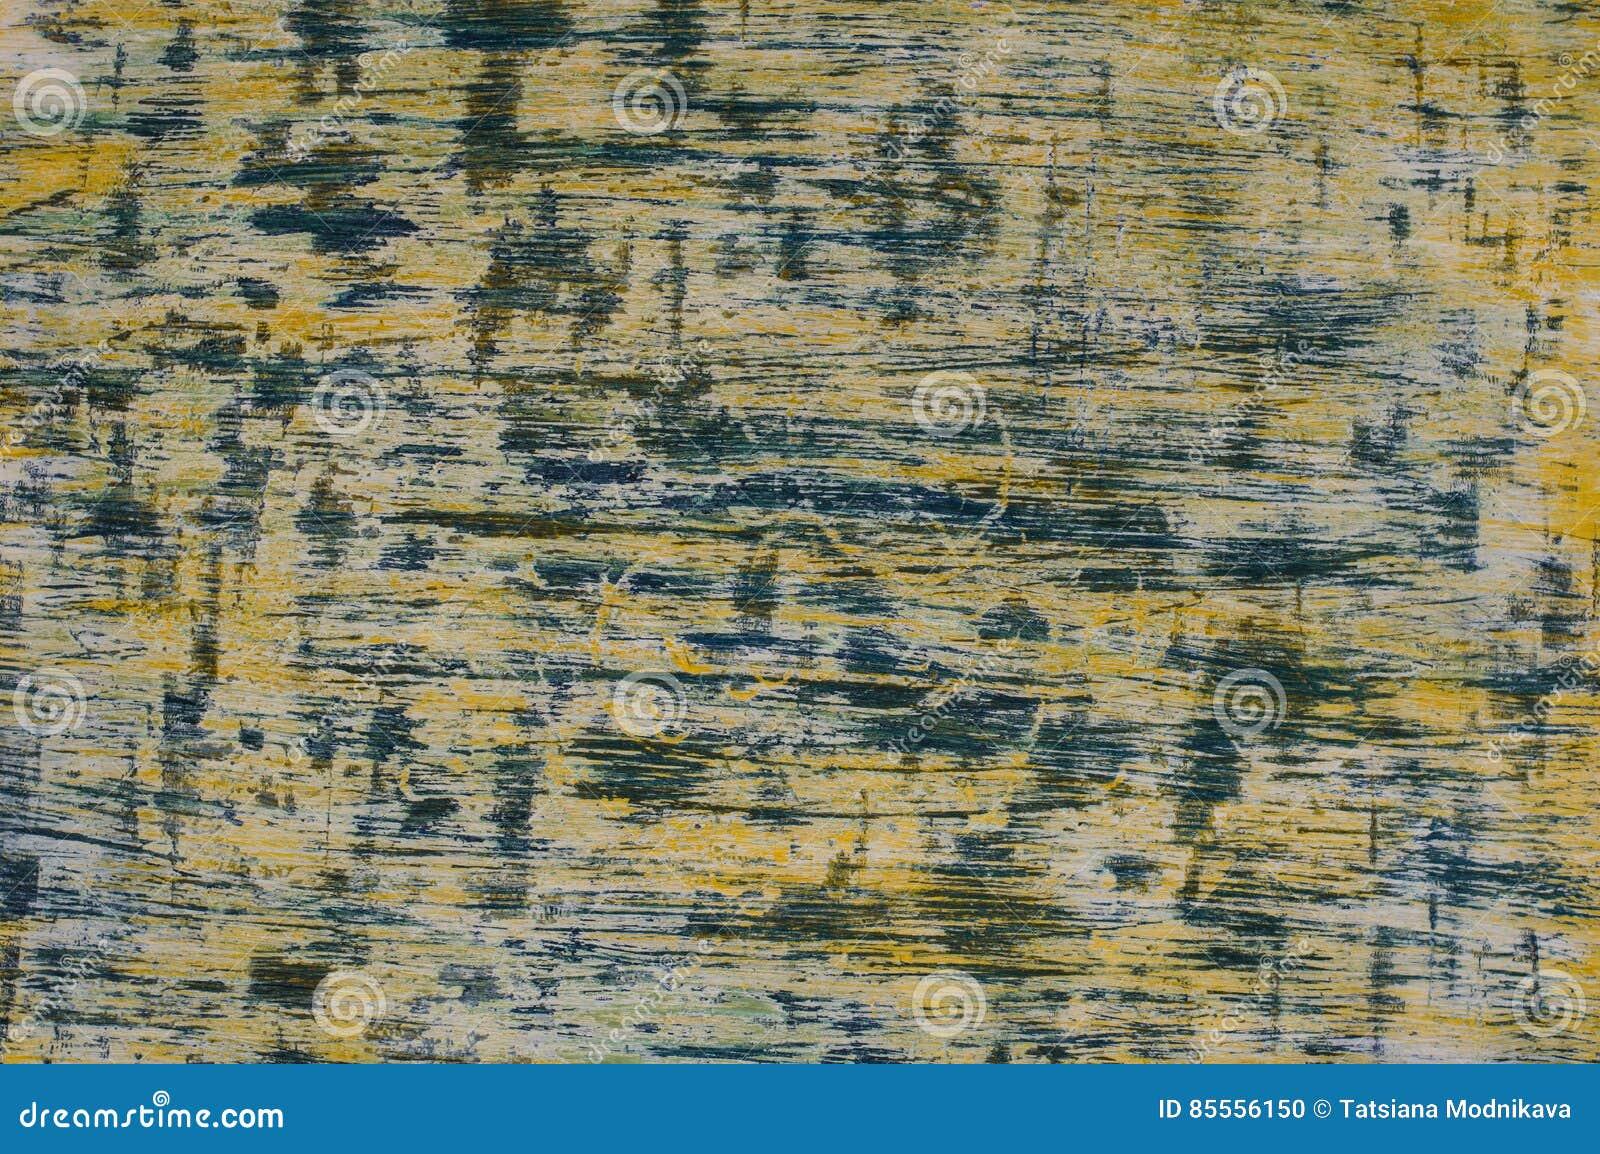 Horizontale gelb-blaue Beschaffenheit handgemacht